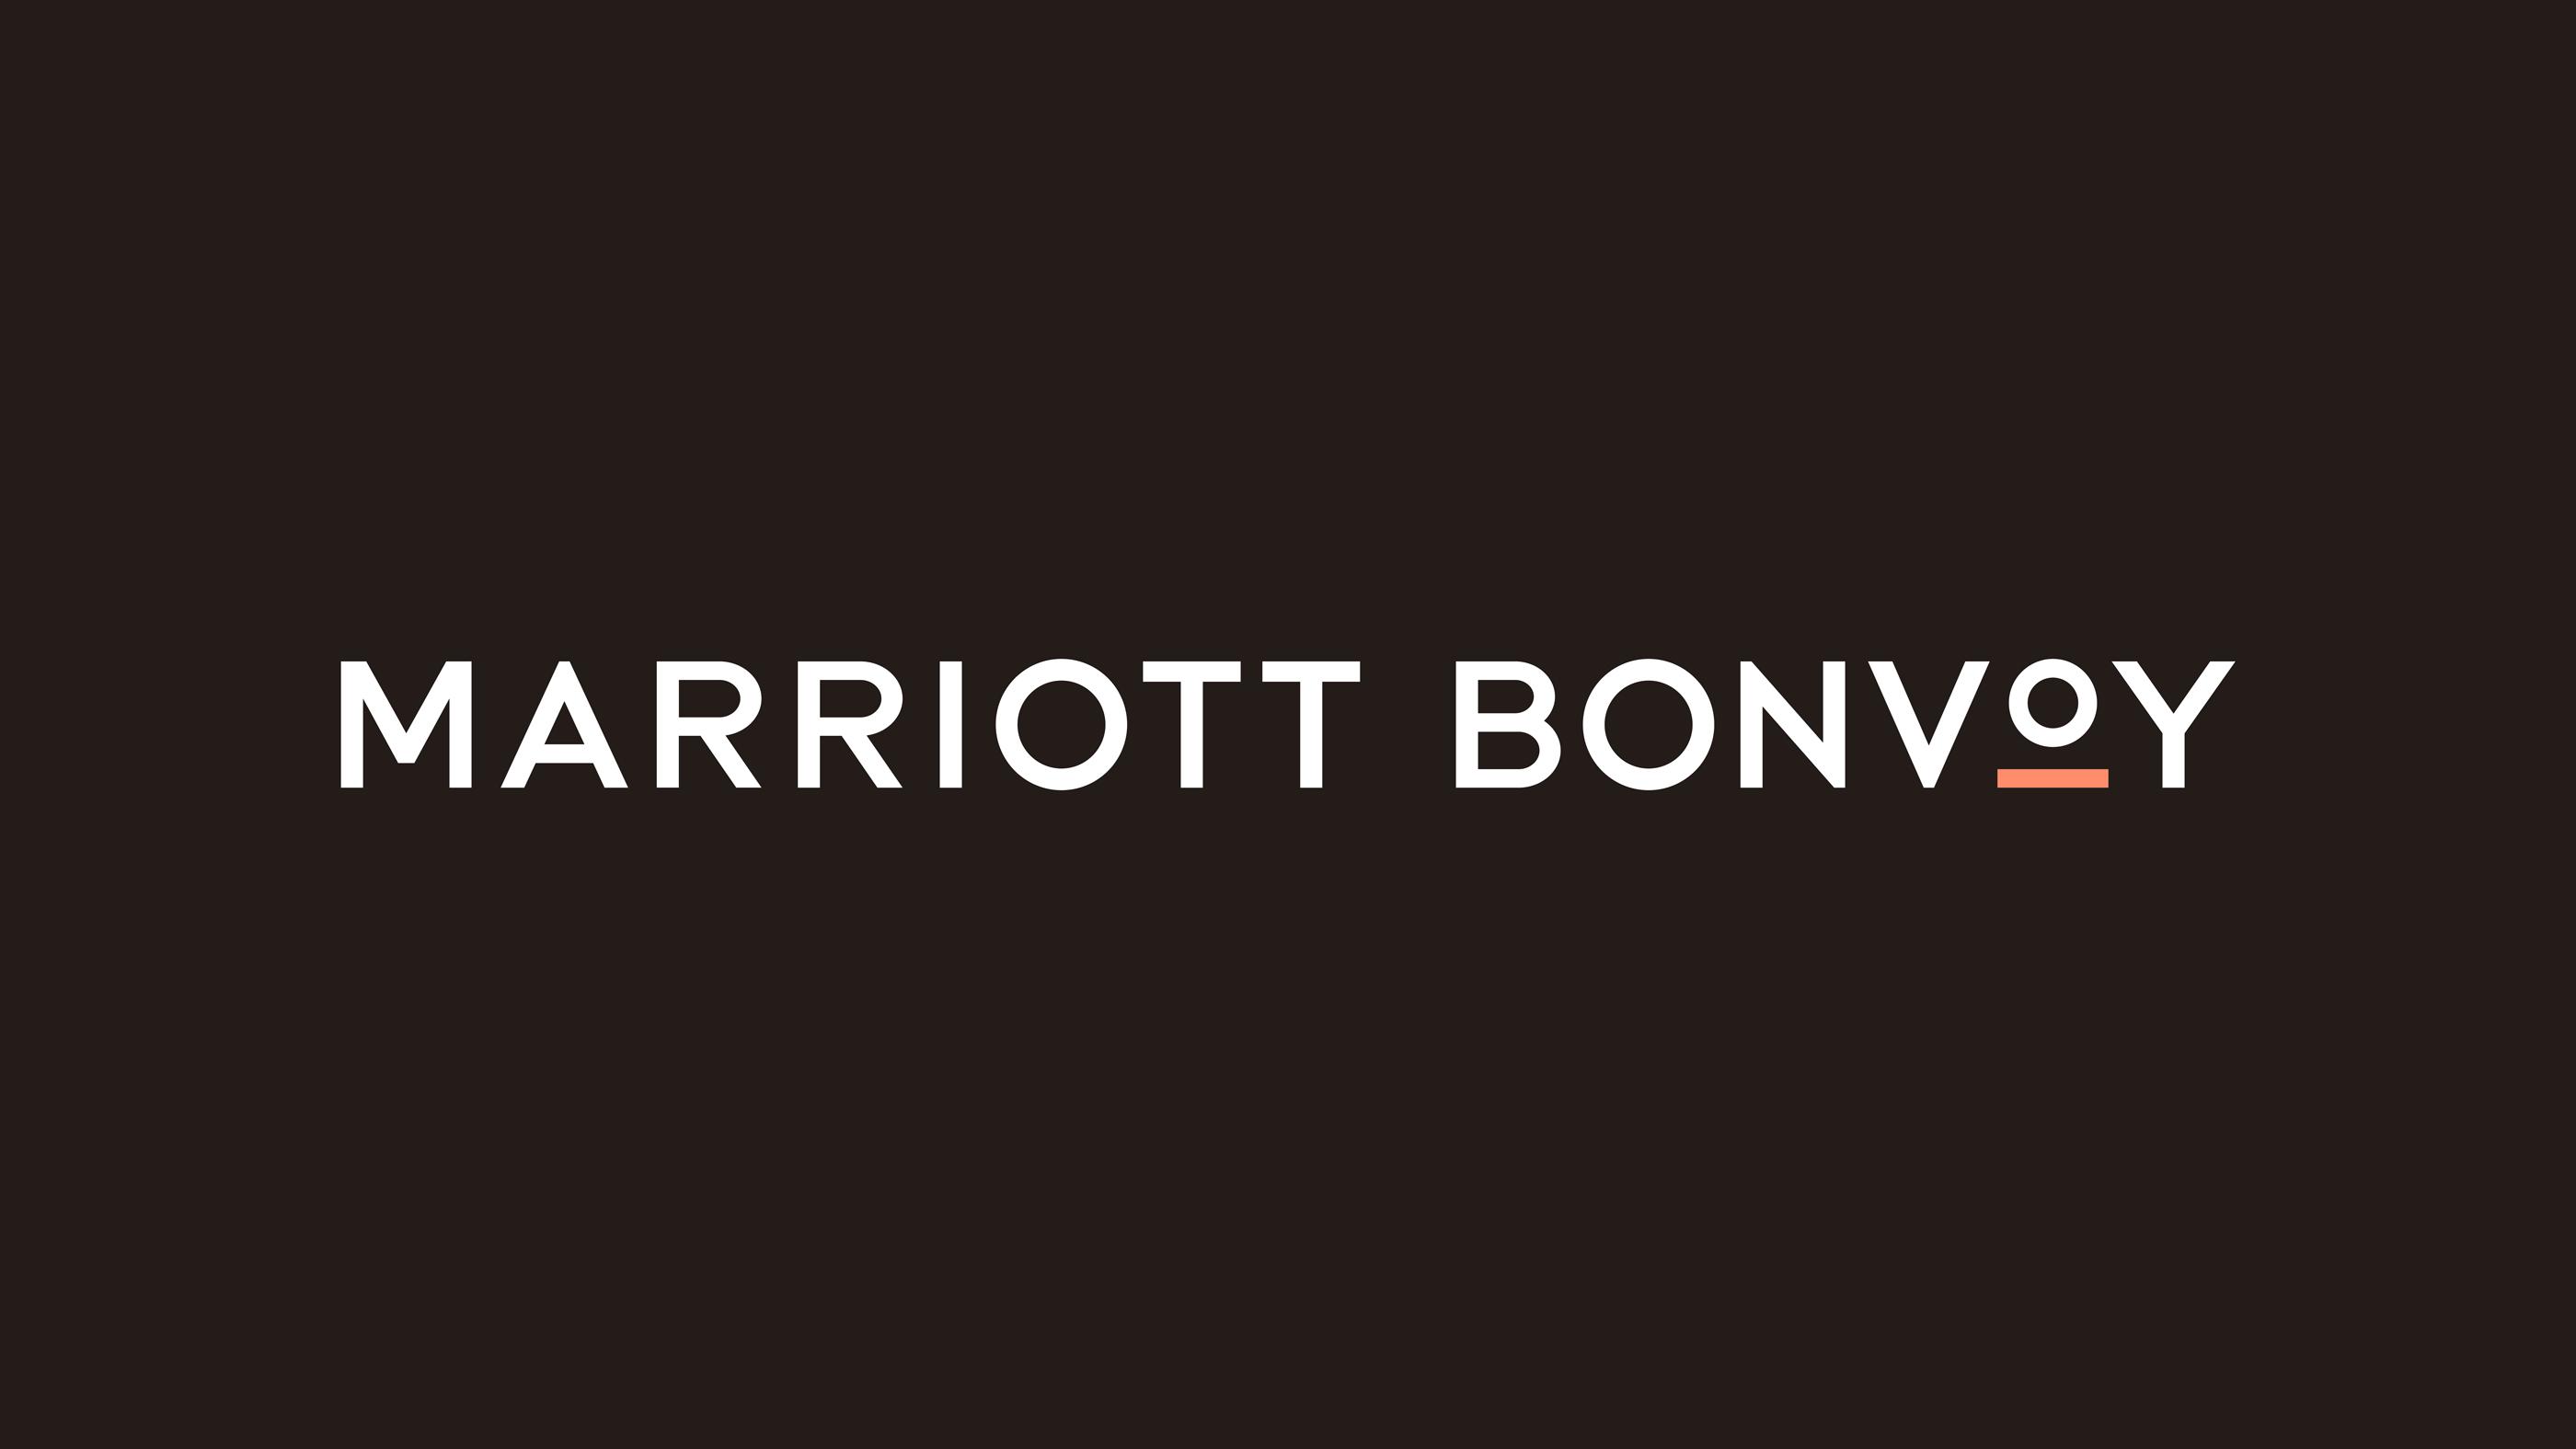 MotherDesign_MarriottBonvoy_06